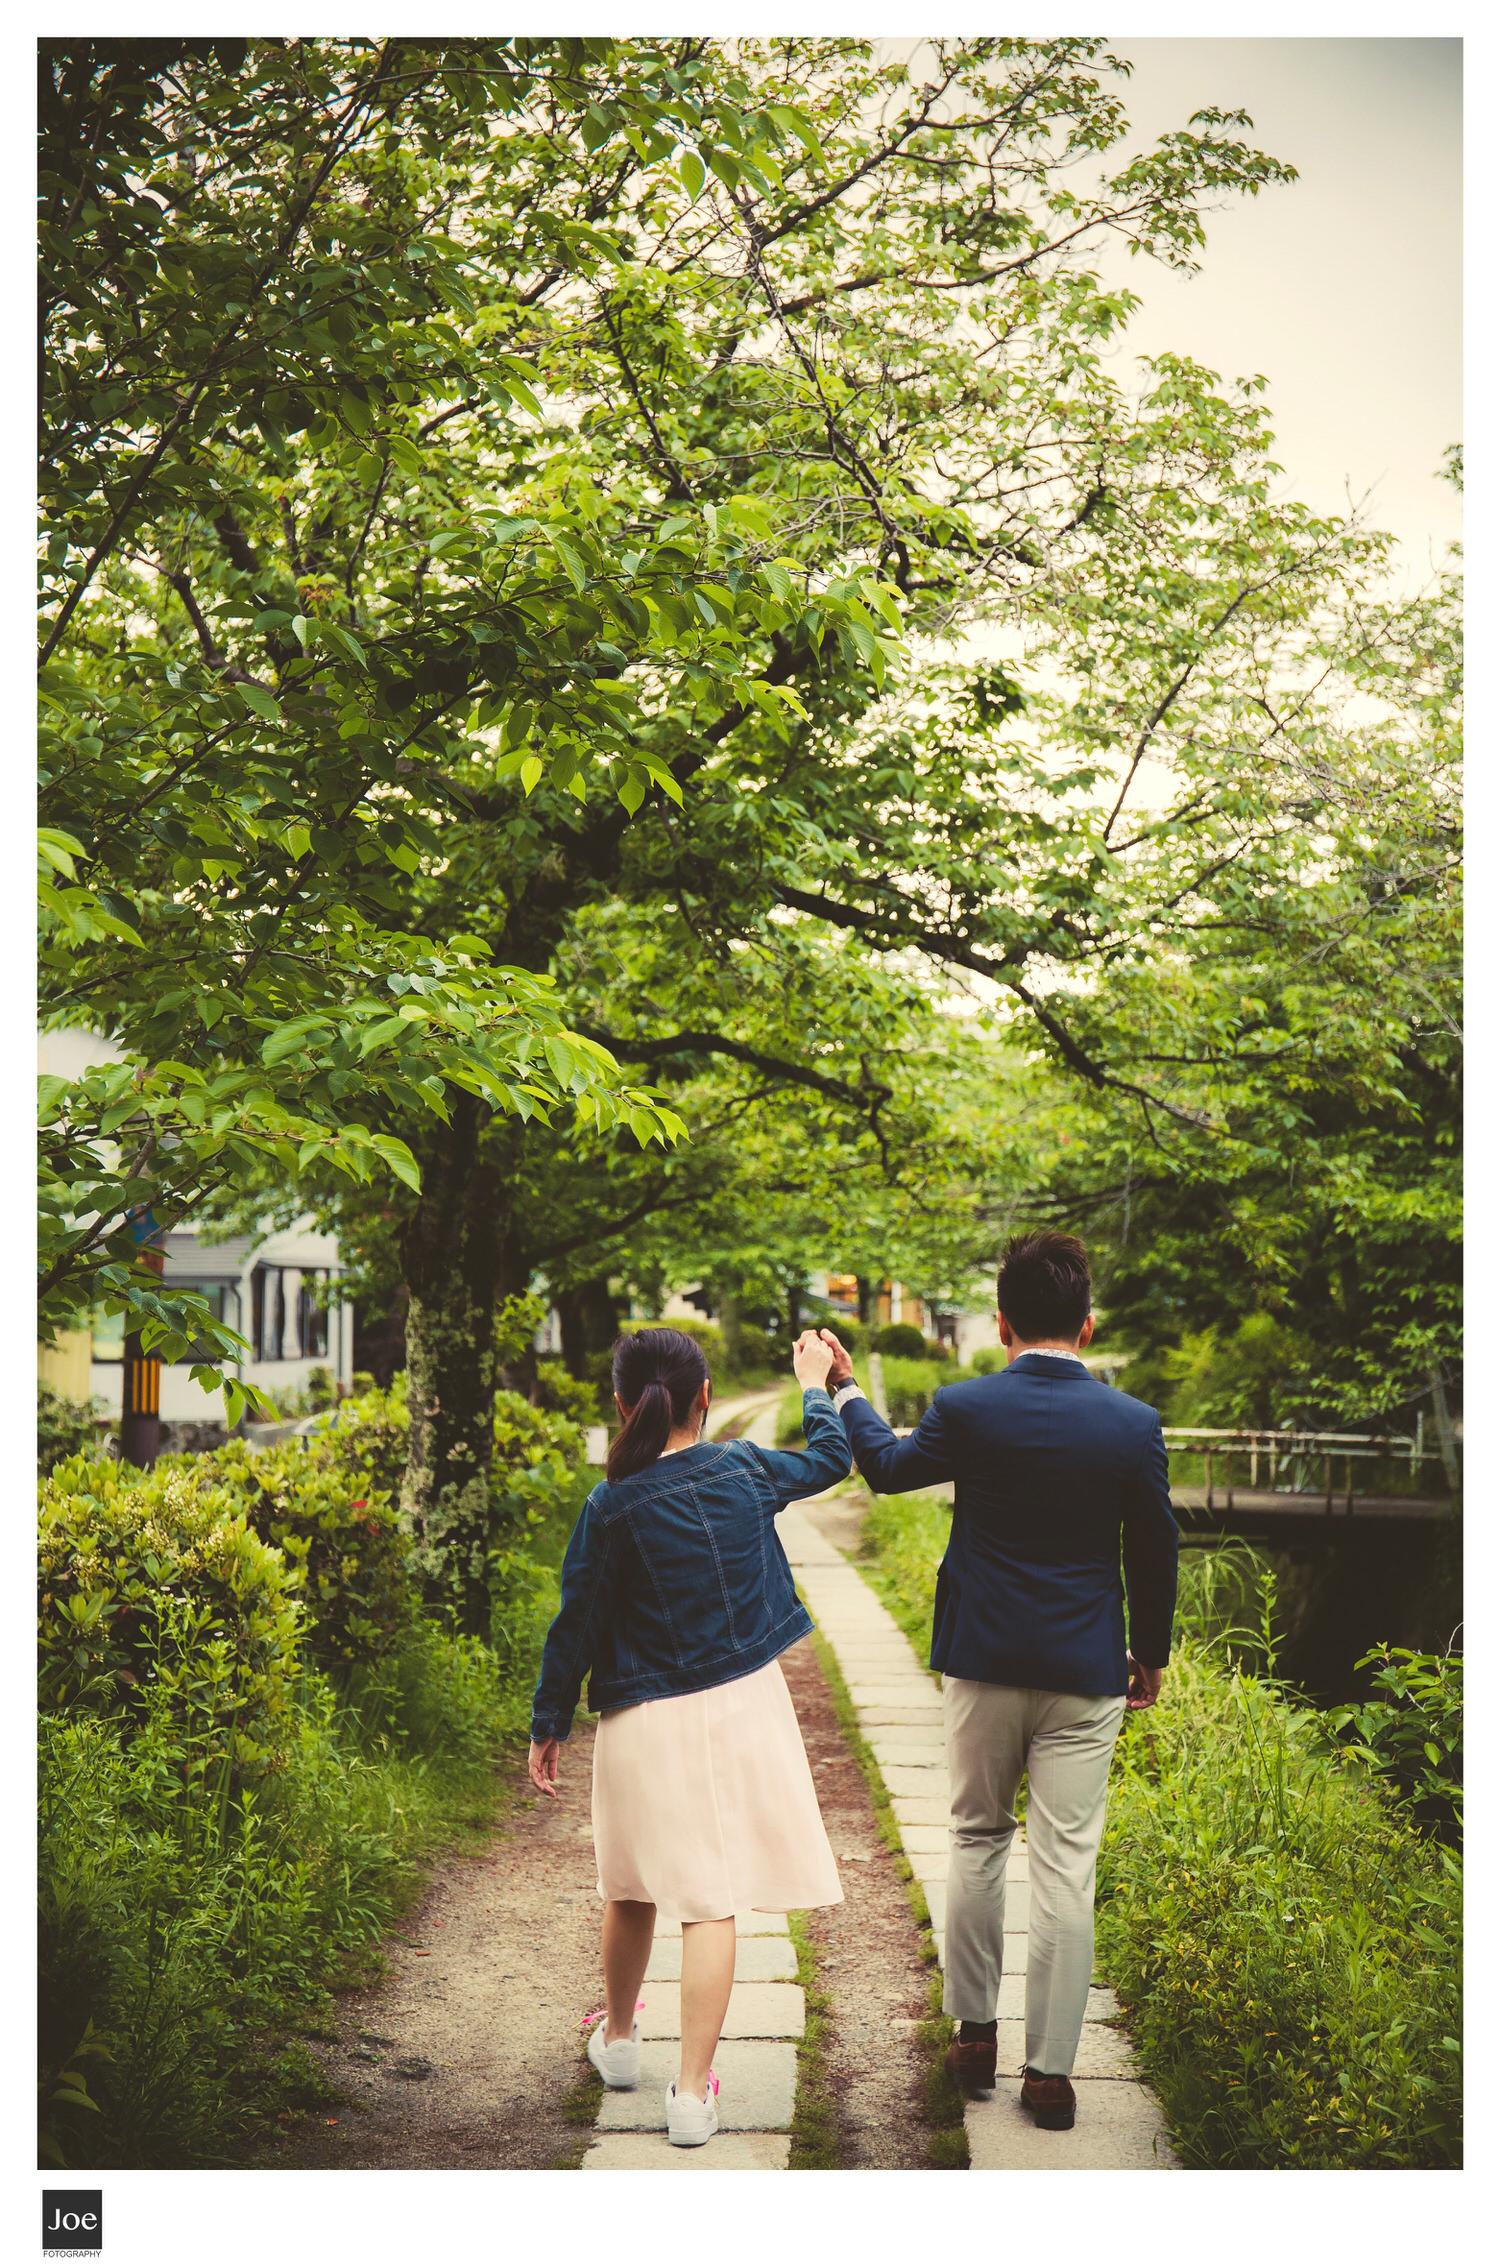 44-the-philosophers-walk-kyoto-pre-wedding-angela-danny-joe-fotography.jpg